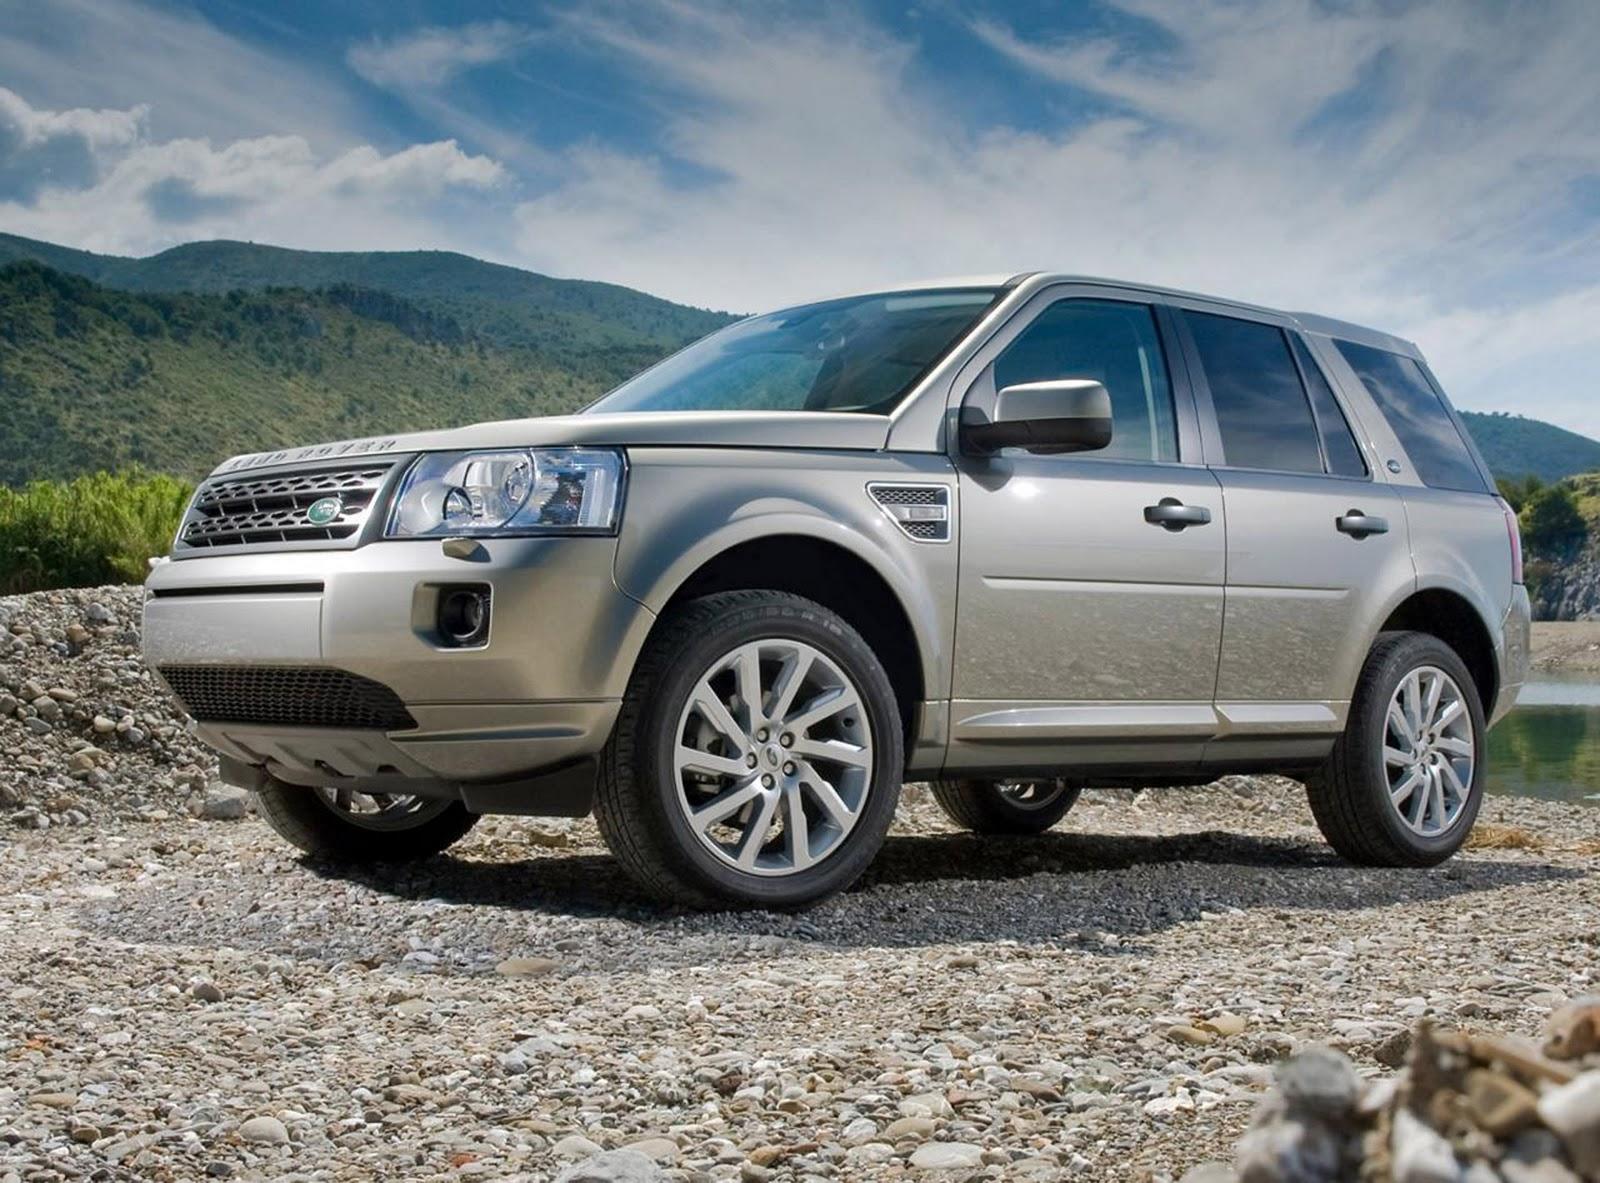 http://4.bp.blogspot.com/-DSwgCH0Bf_A/TqaToWSfrwI/AAAAAAAACww/AzzMw03UyYY/s1600/2010-Land-Rover-Freelander-2-SD4-Sport-Limited-Edition_92.jpg